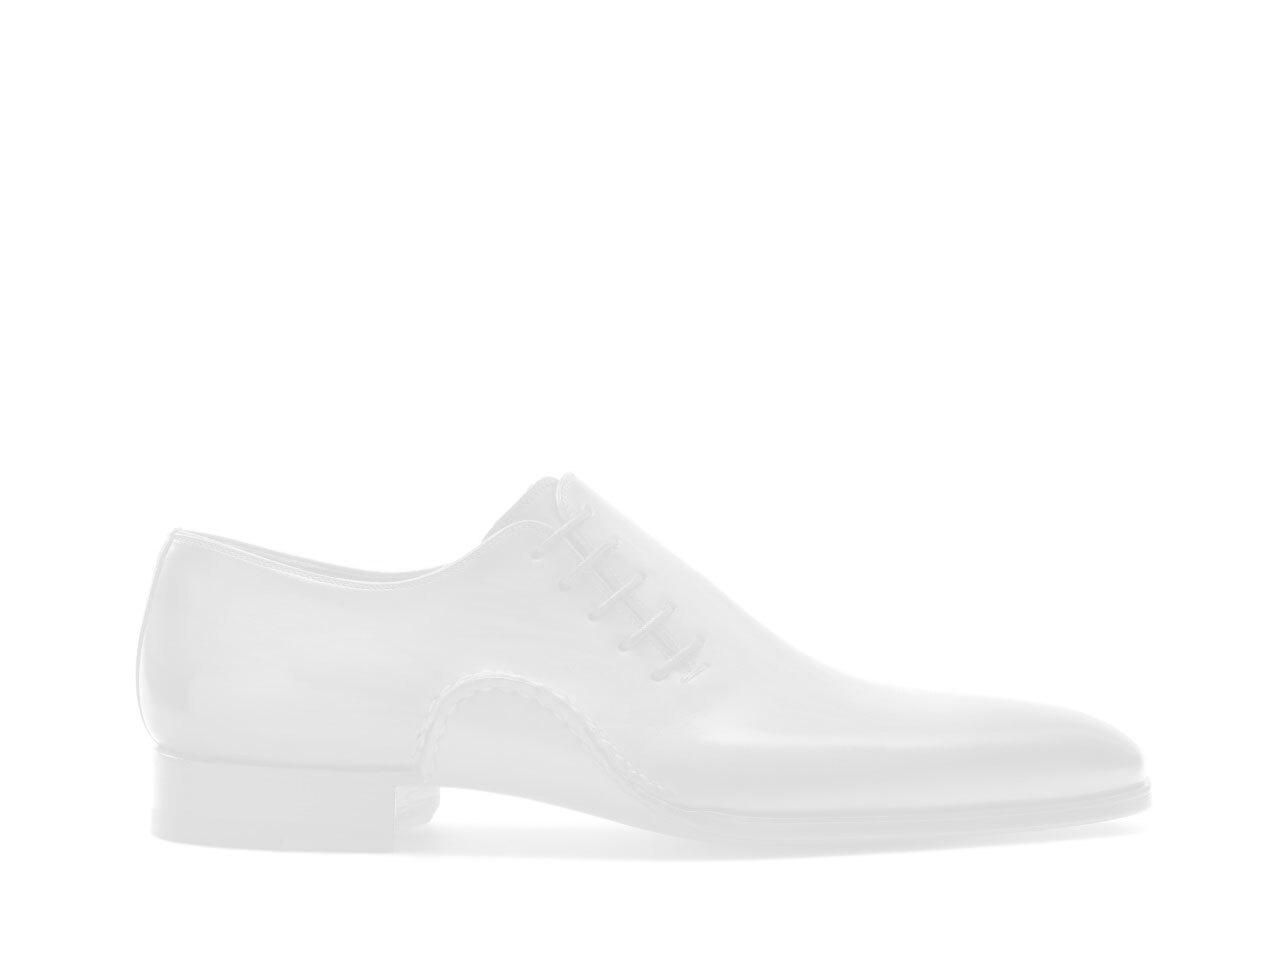 Pair of the Magnanni Jefferson Black Men's Oxford Shoes